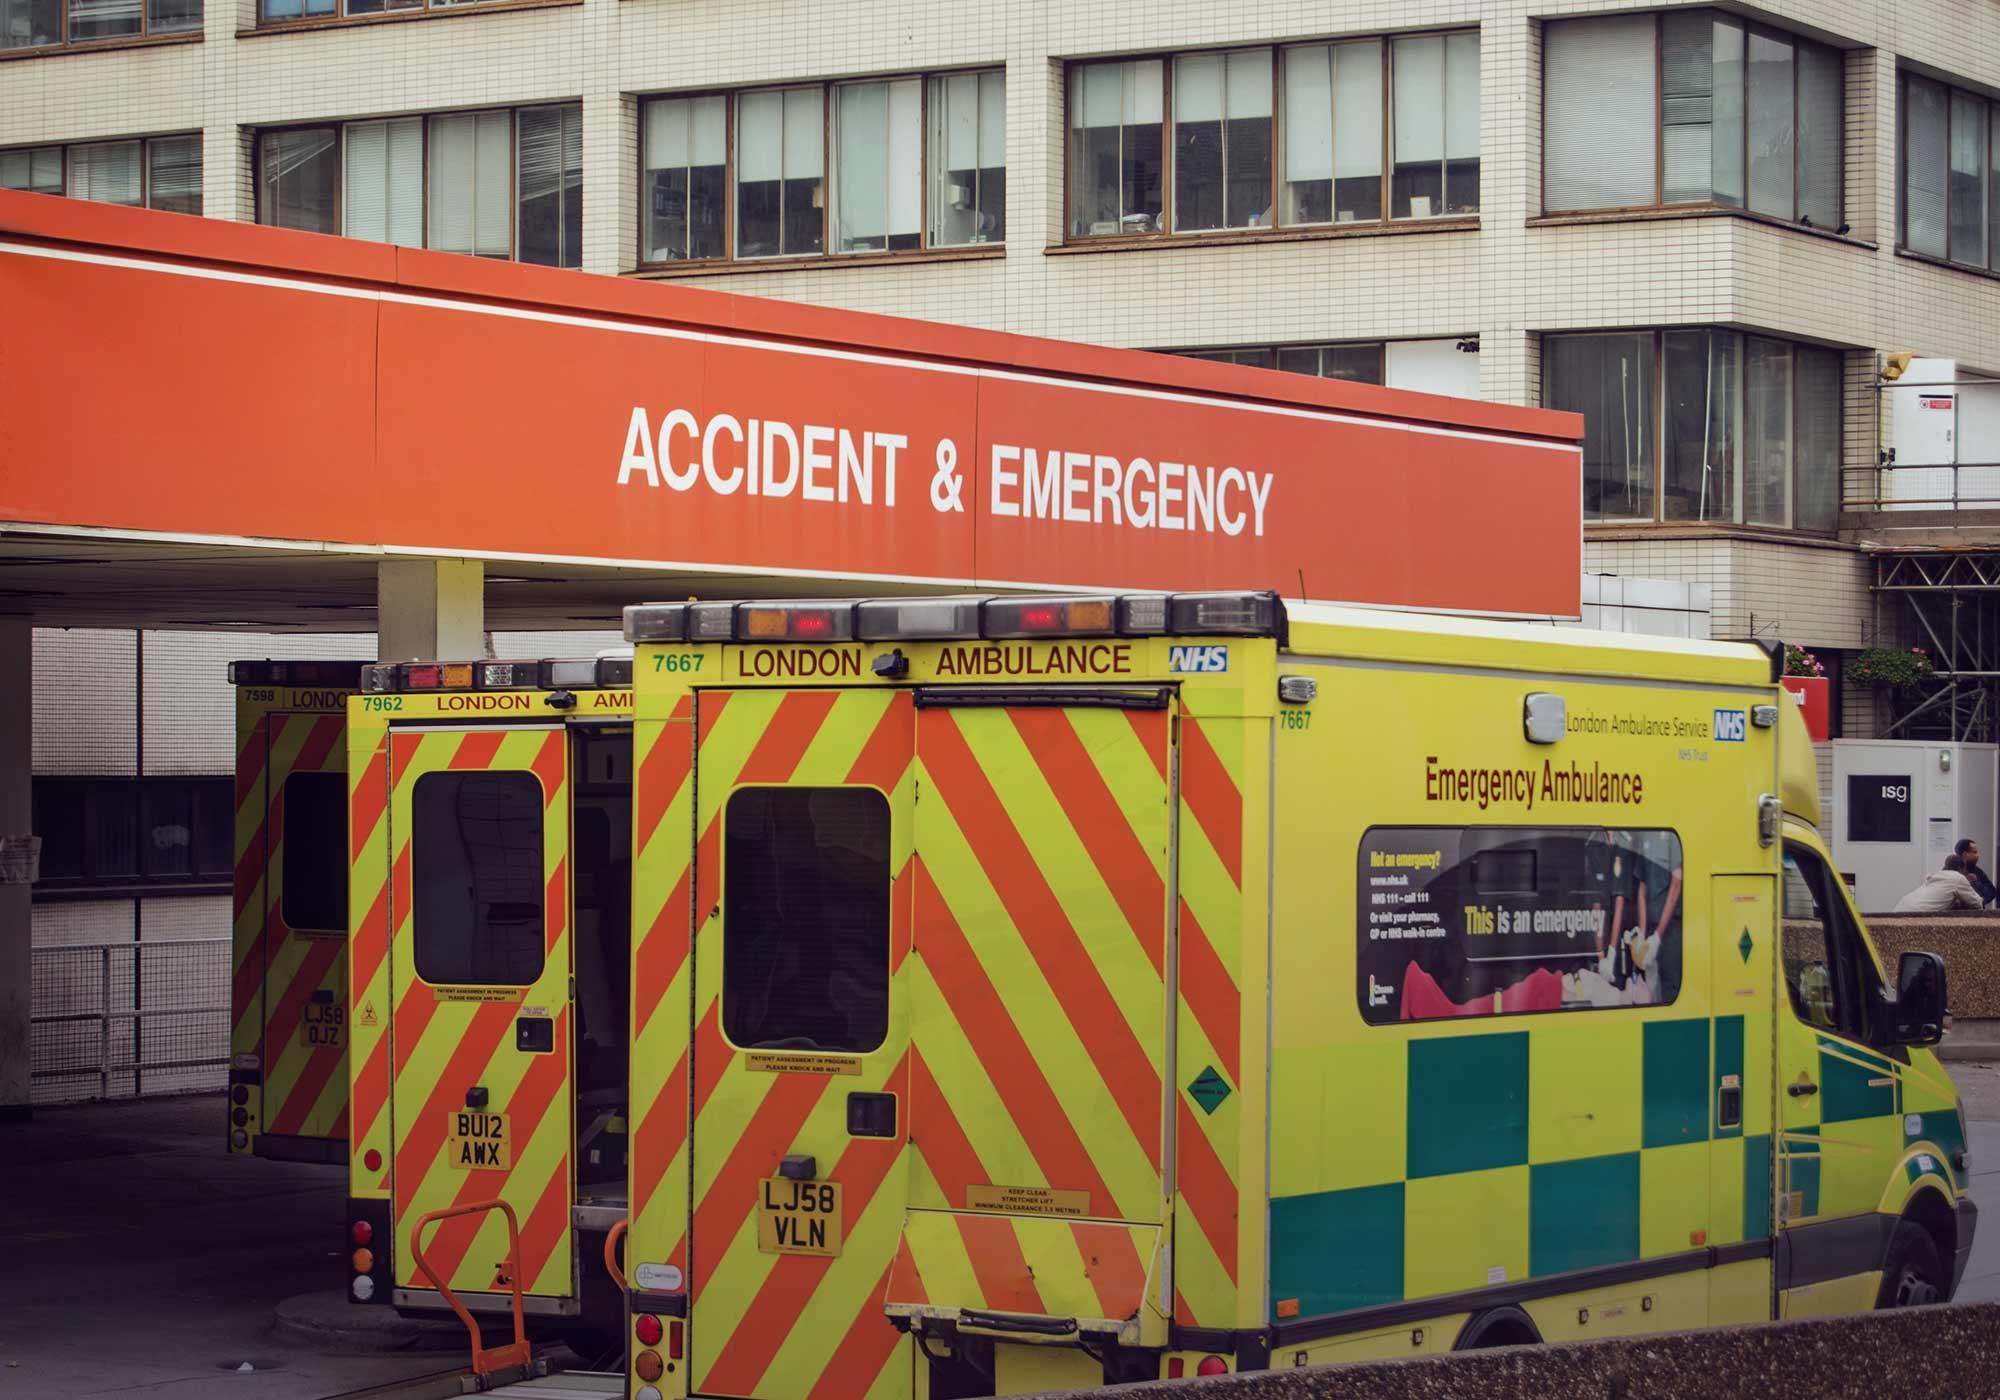 Responding to emergency vehicles